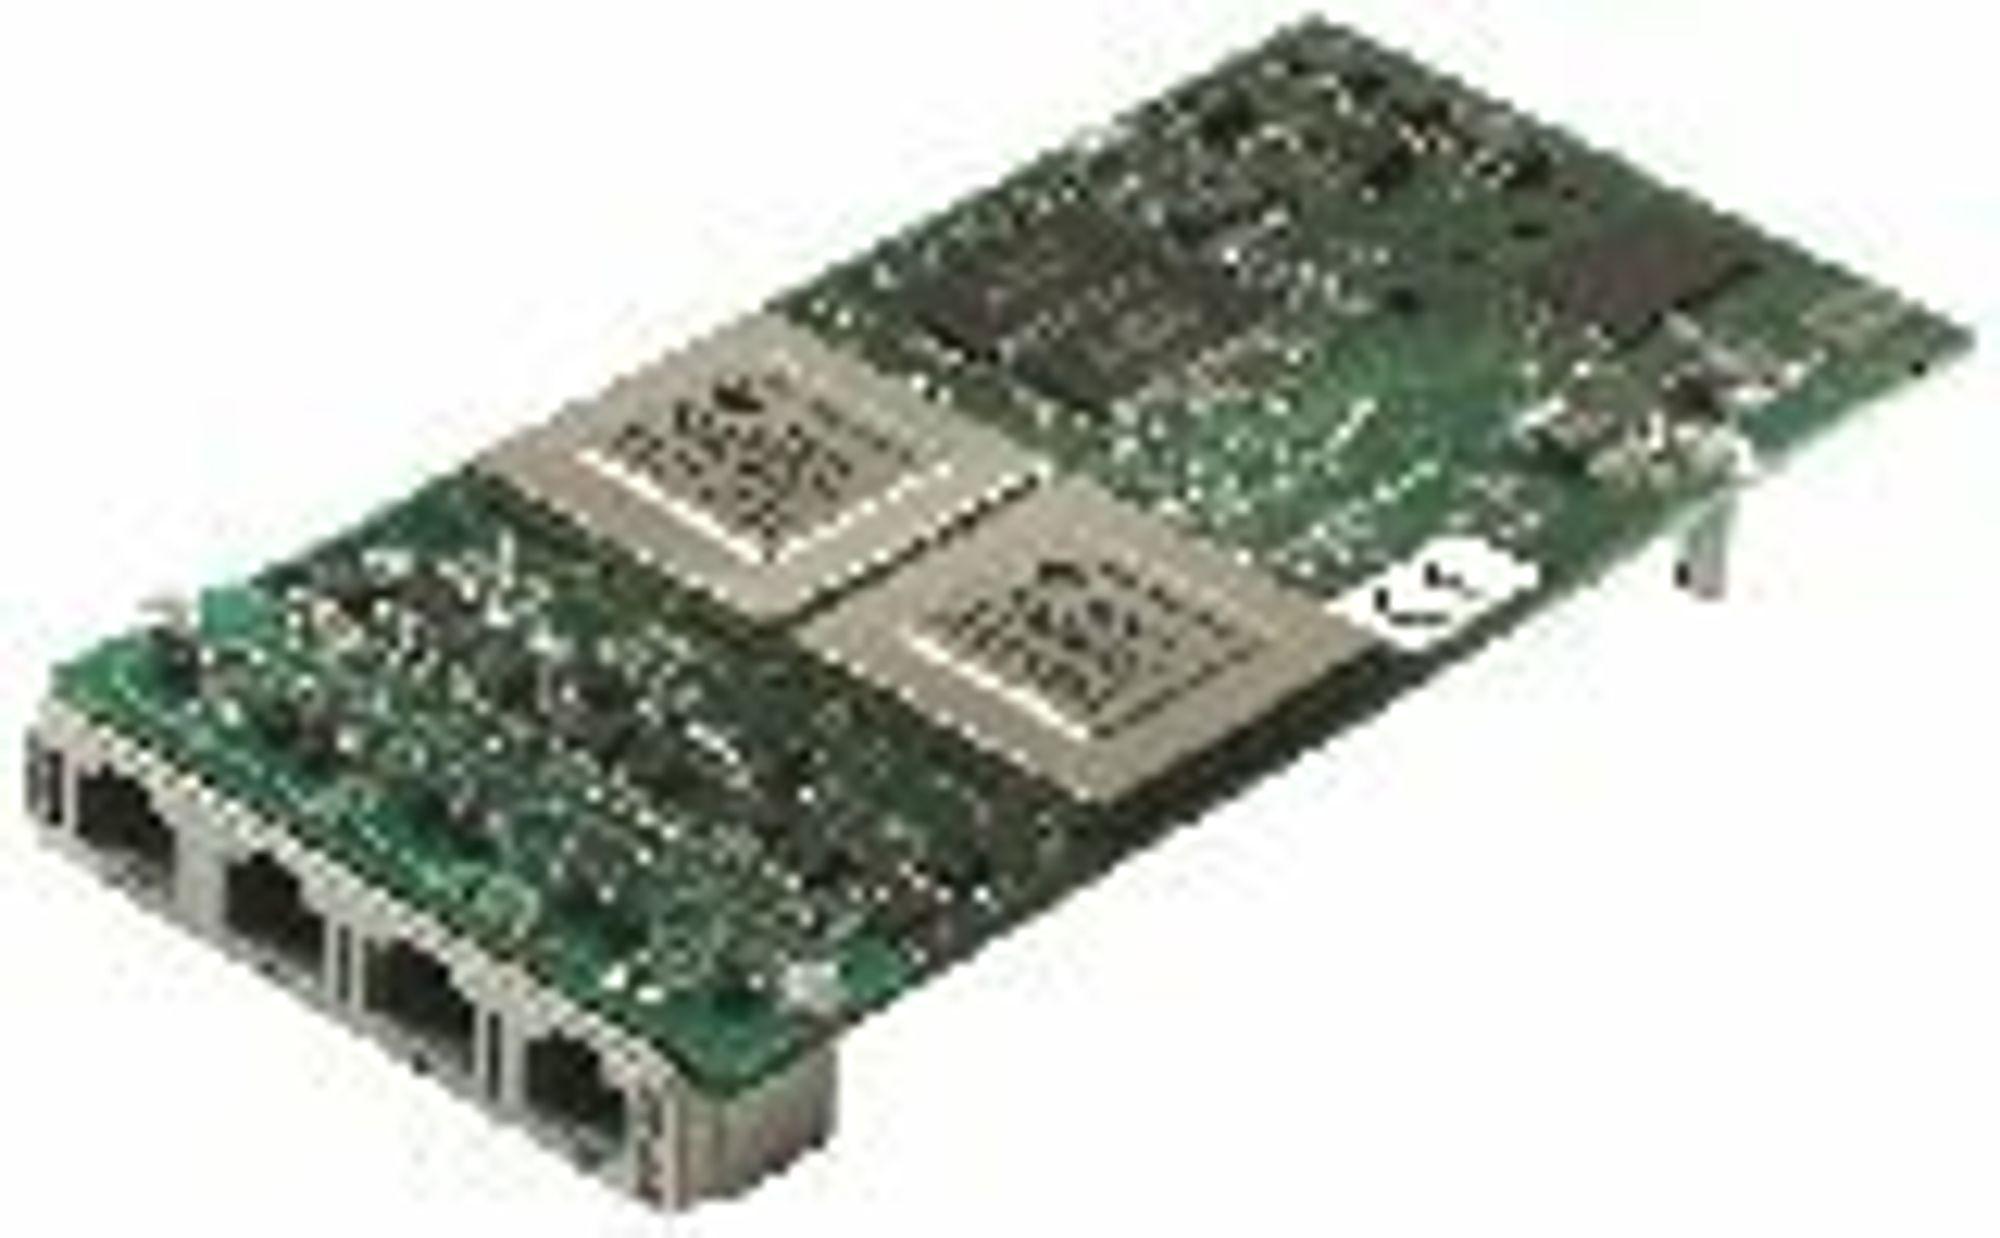 SMAS-basert E1/T1 Network Interface Board fra Comuniq.